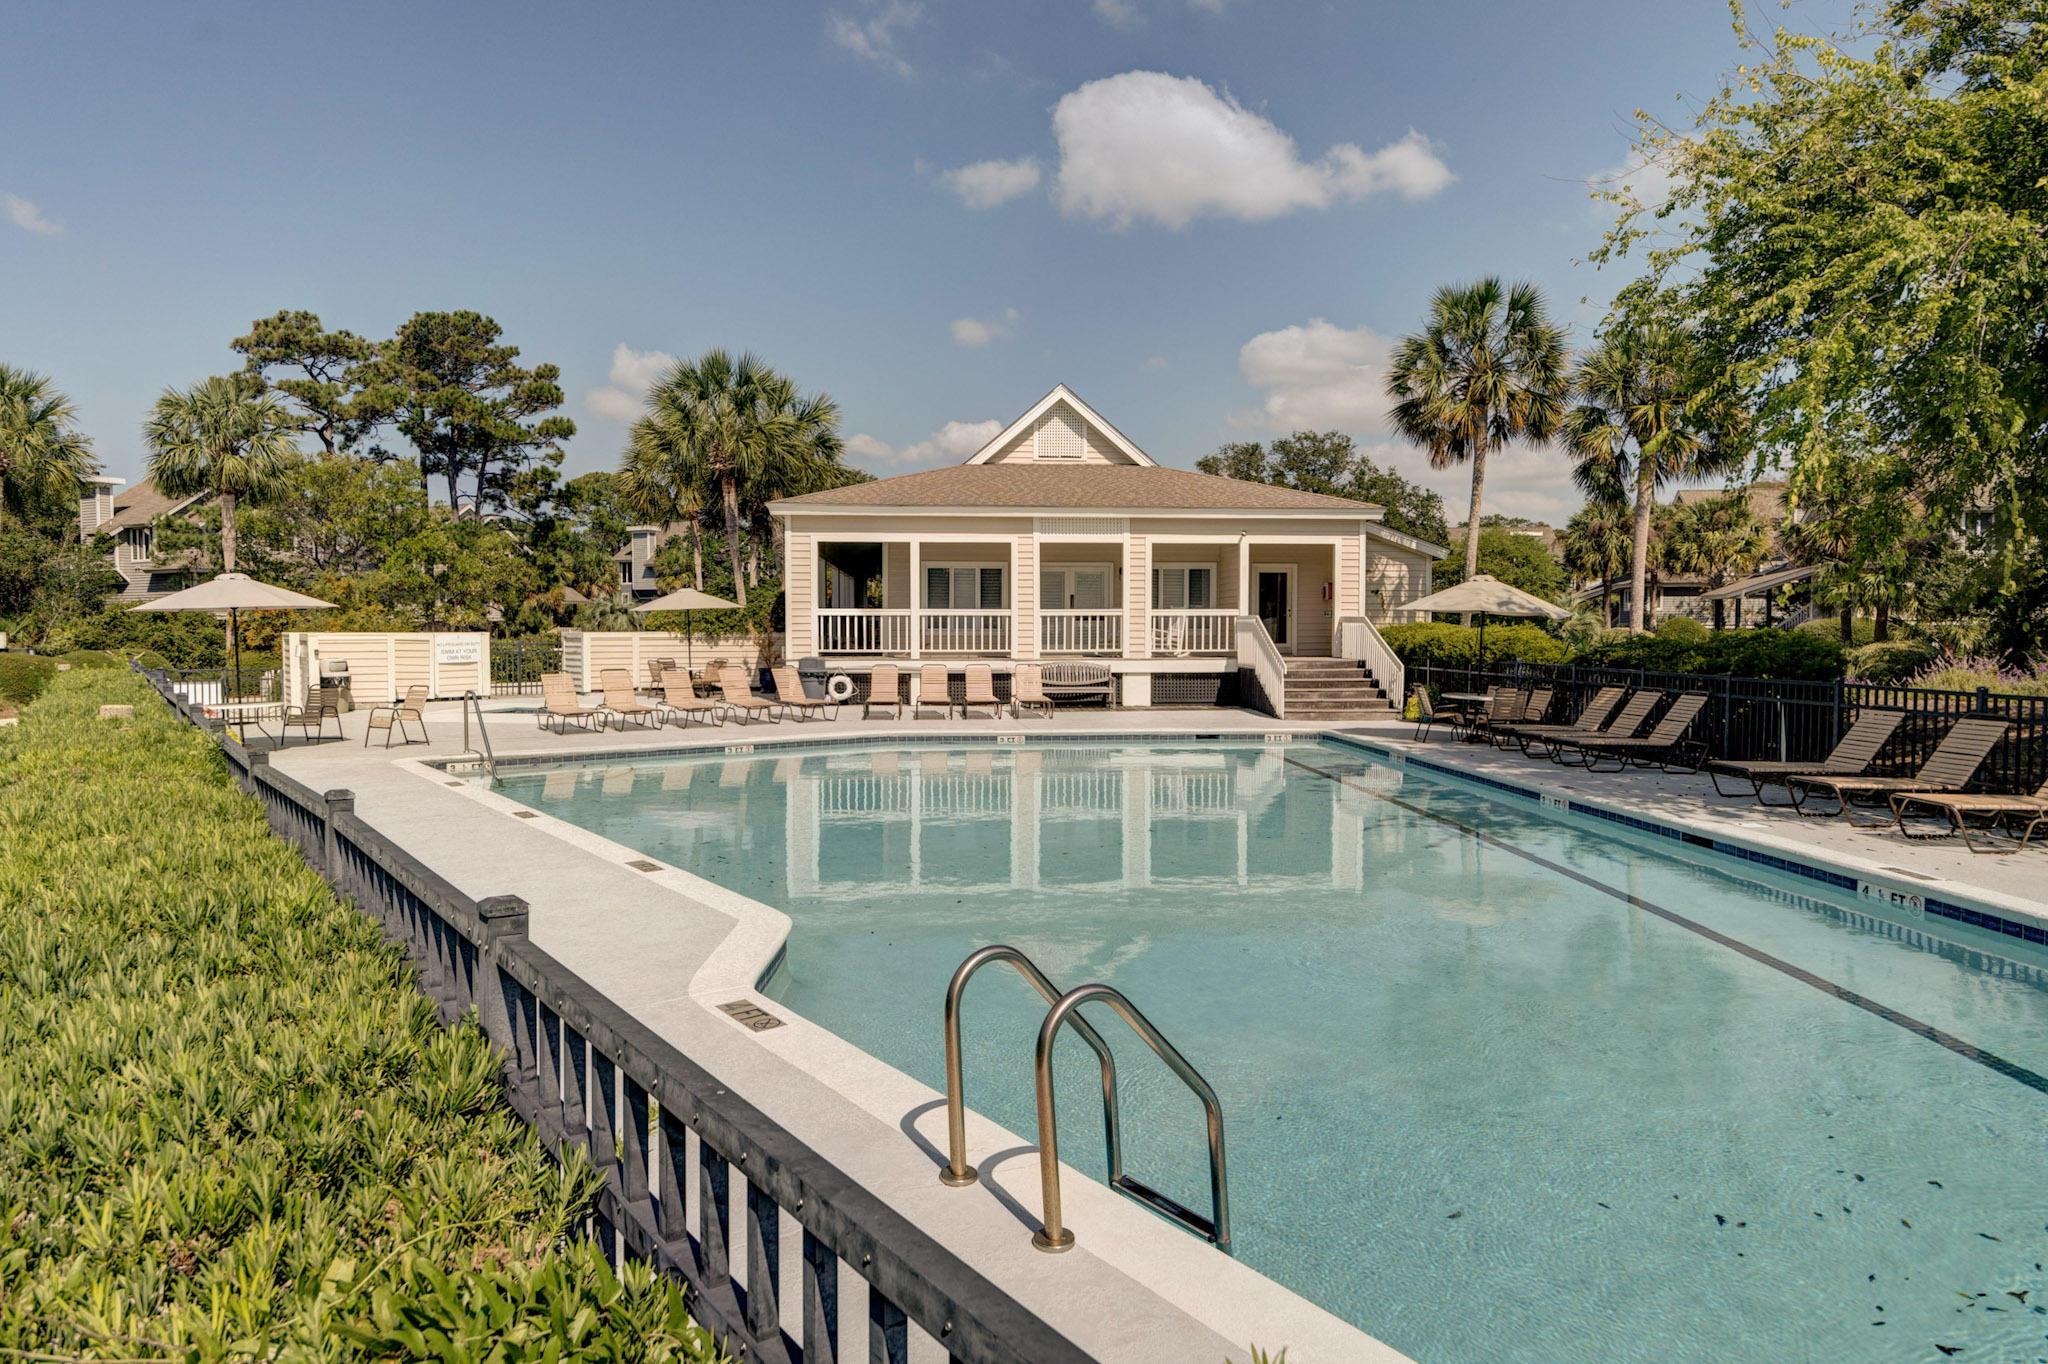 Creek Watch Villas Homes For Sale - 1244 Creek Watch, Johns Island, SC - 27